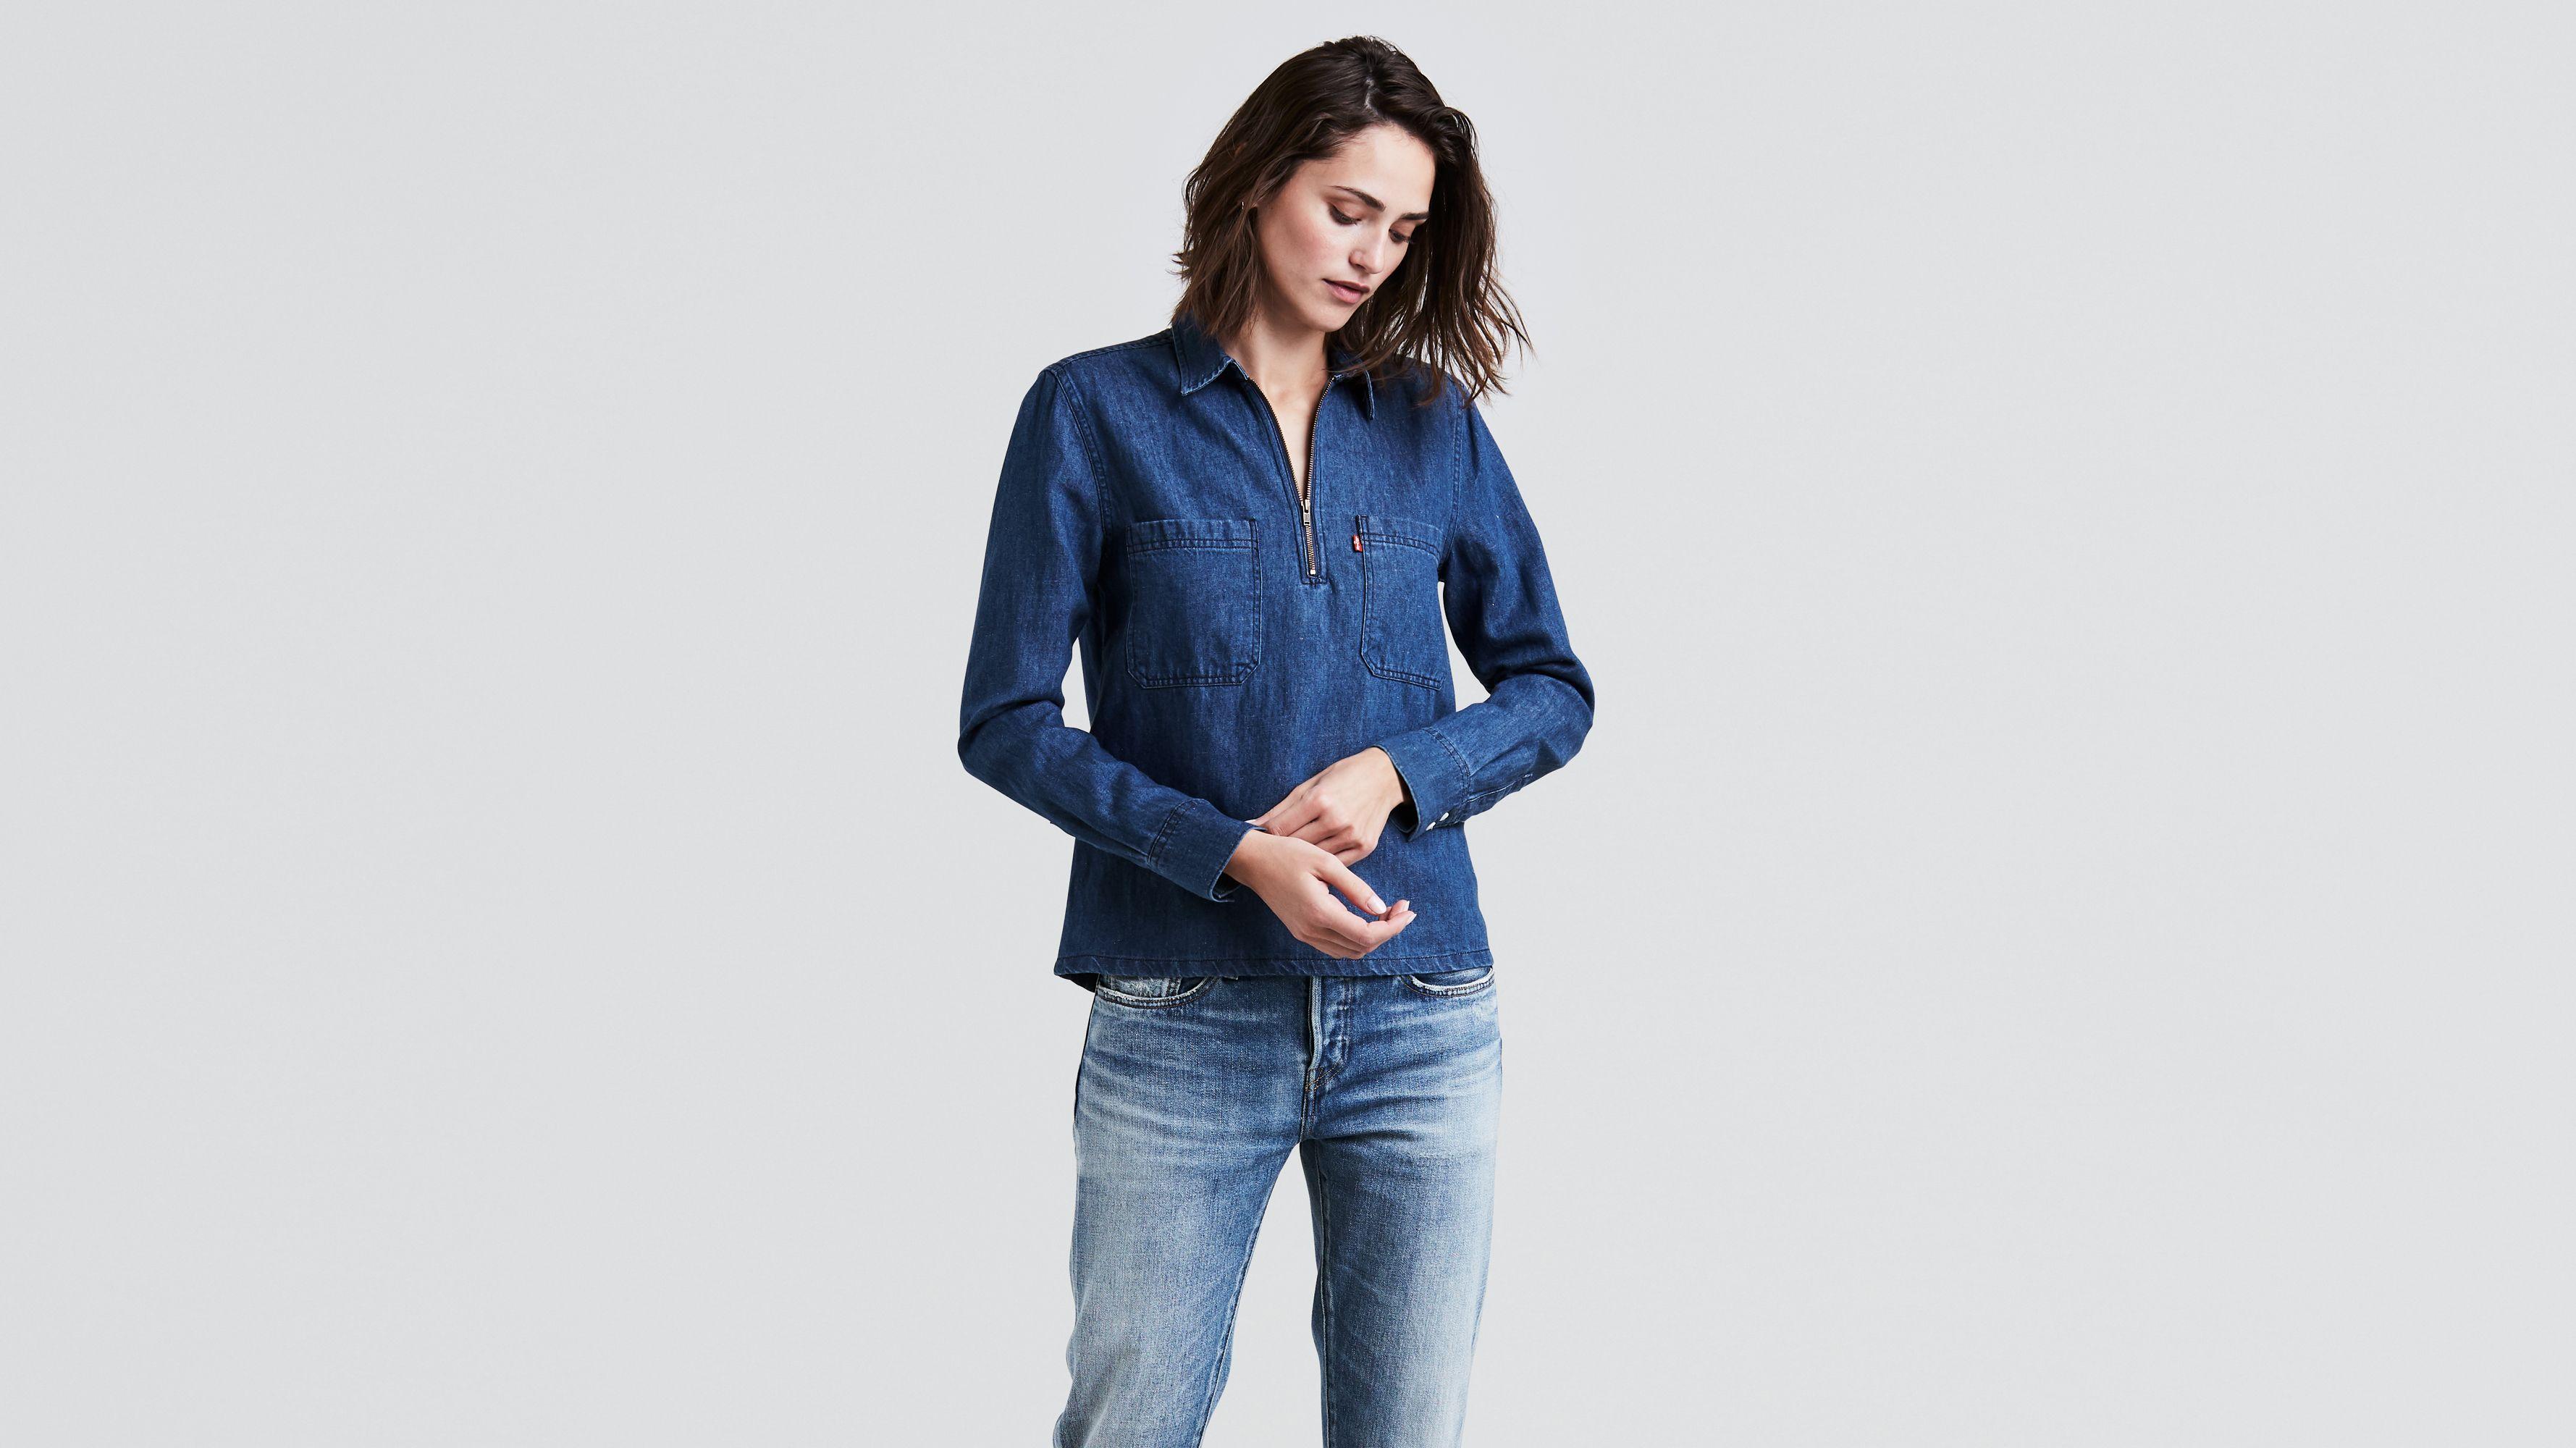 tops tank blouses shirts denim t levi's® Women's shirts us amp; tIqBSS